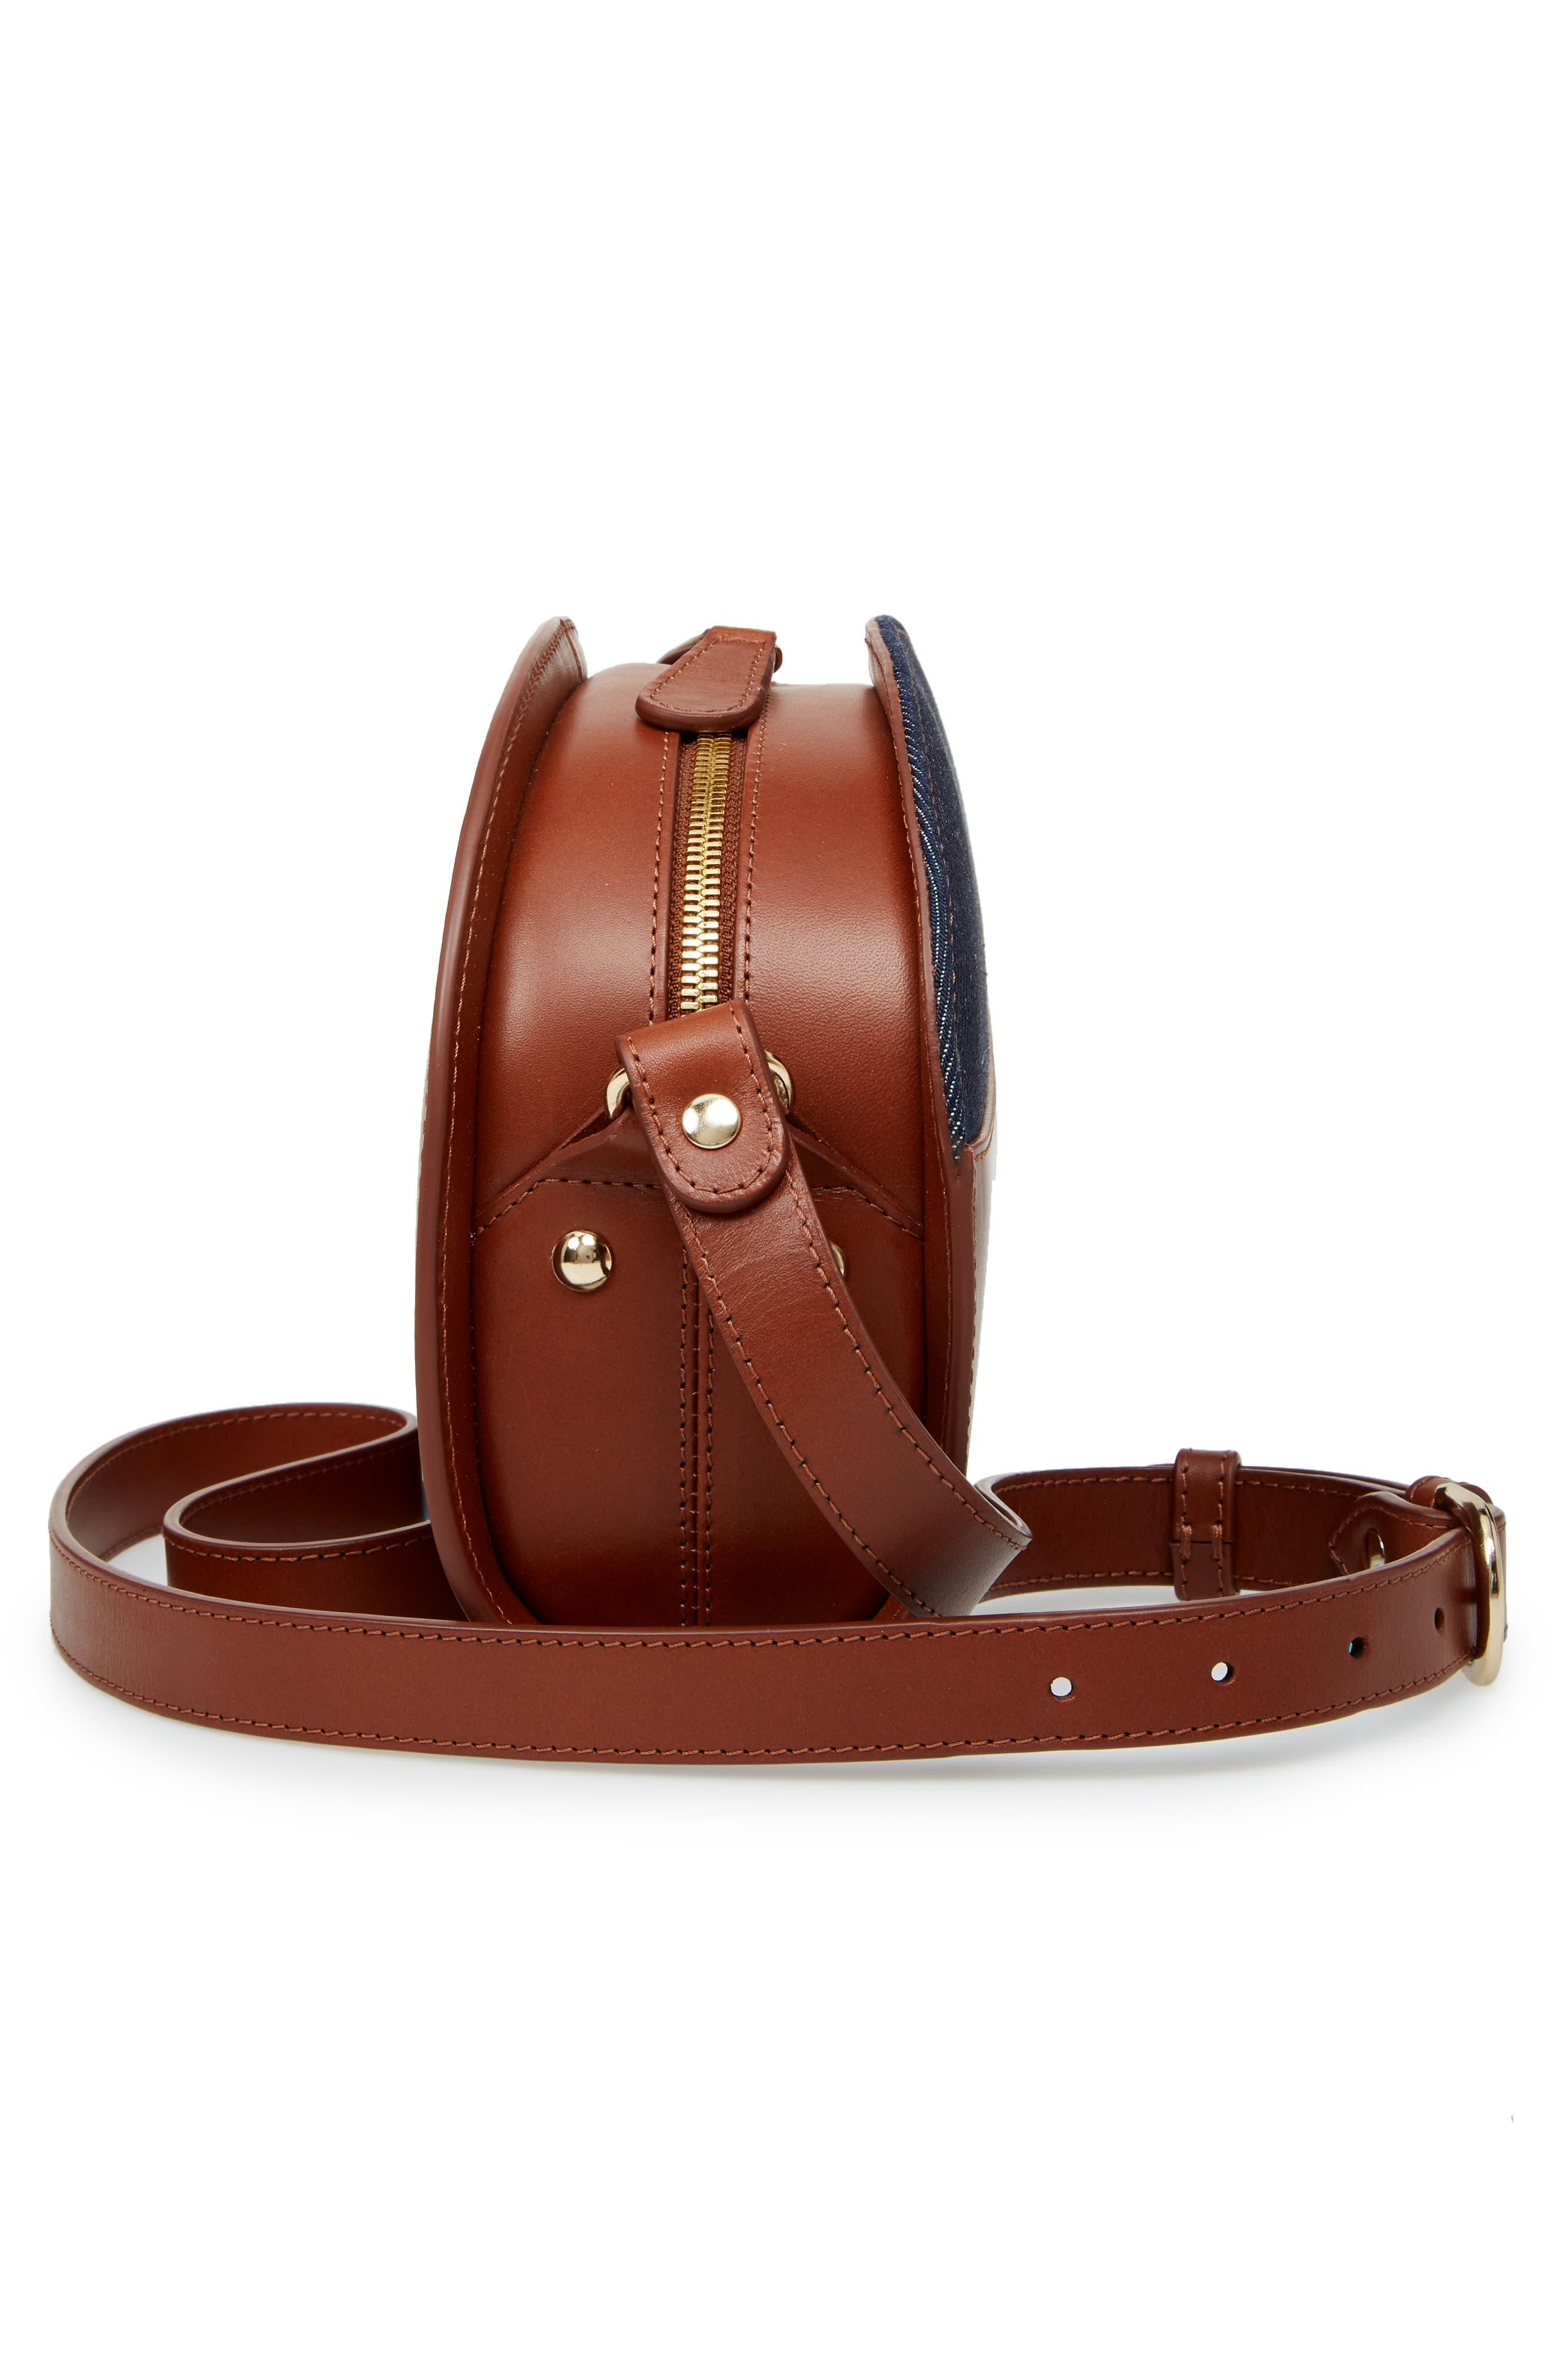 Sac Demilune Leather & Denim Crossbody Bag,                             Alternate thumbnail 5, color,                             NOISETTE CAD